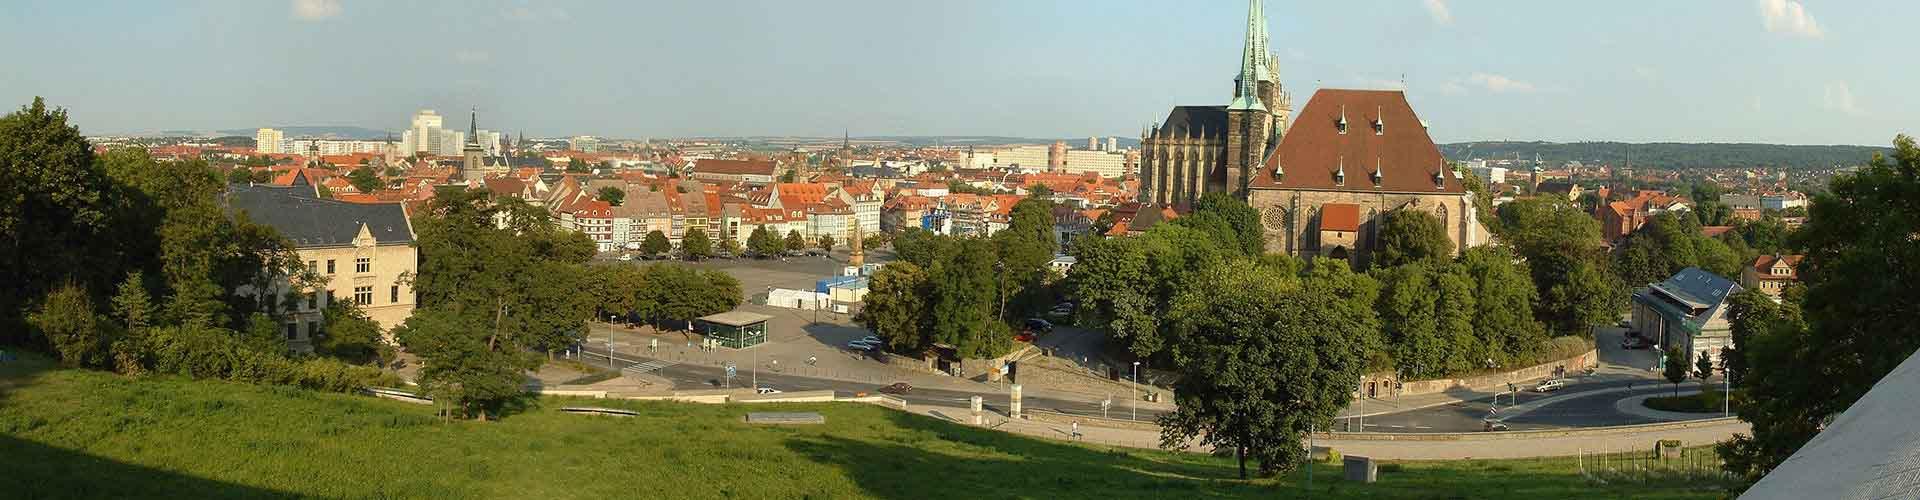 Erfurt - Albergues en Erfurt. Mapas de Erfurt, Fotos y Comentarios para cada Albergue en Erfurt.